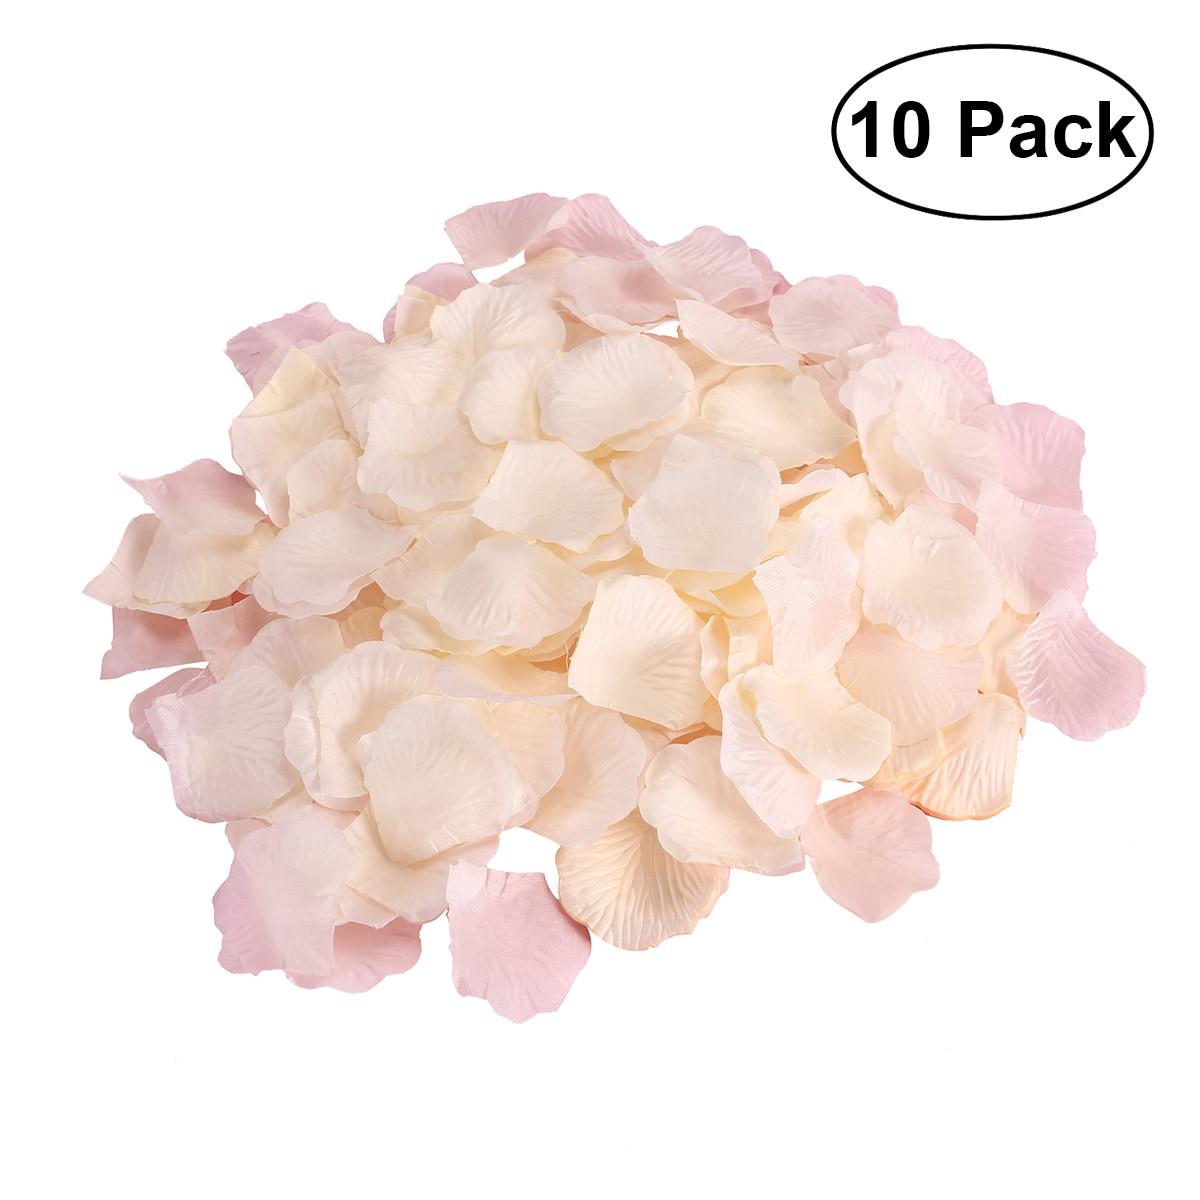 10 Pack Fake Rose Petals Artificial Wedding Flower Decoration